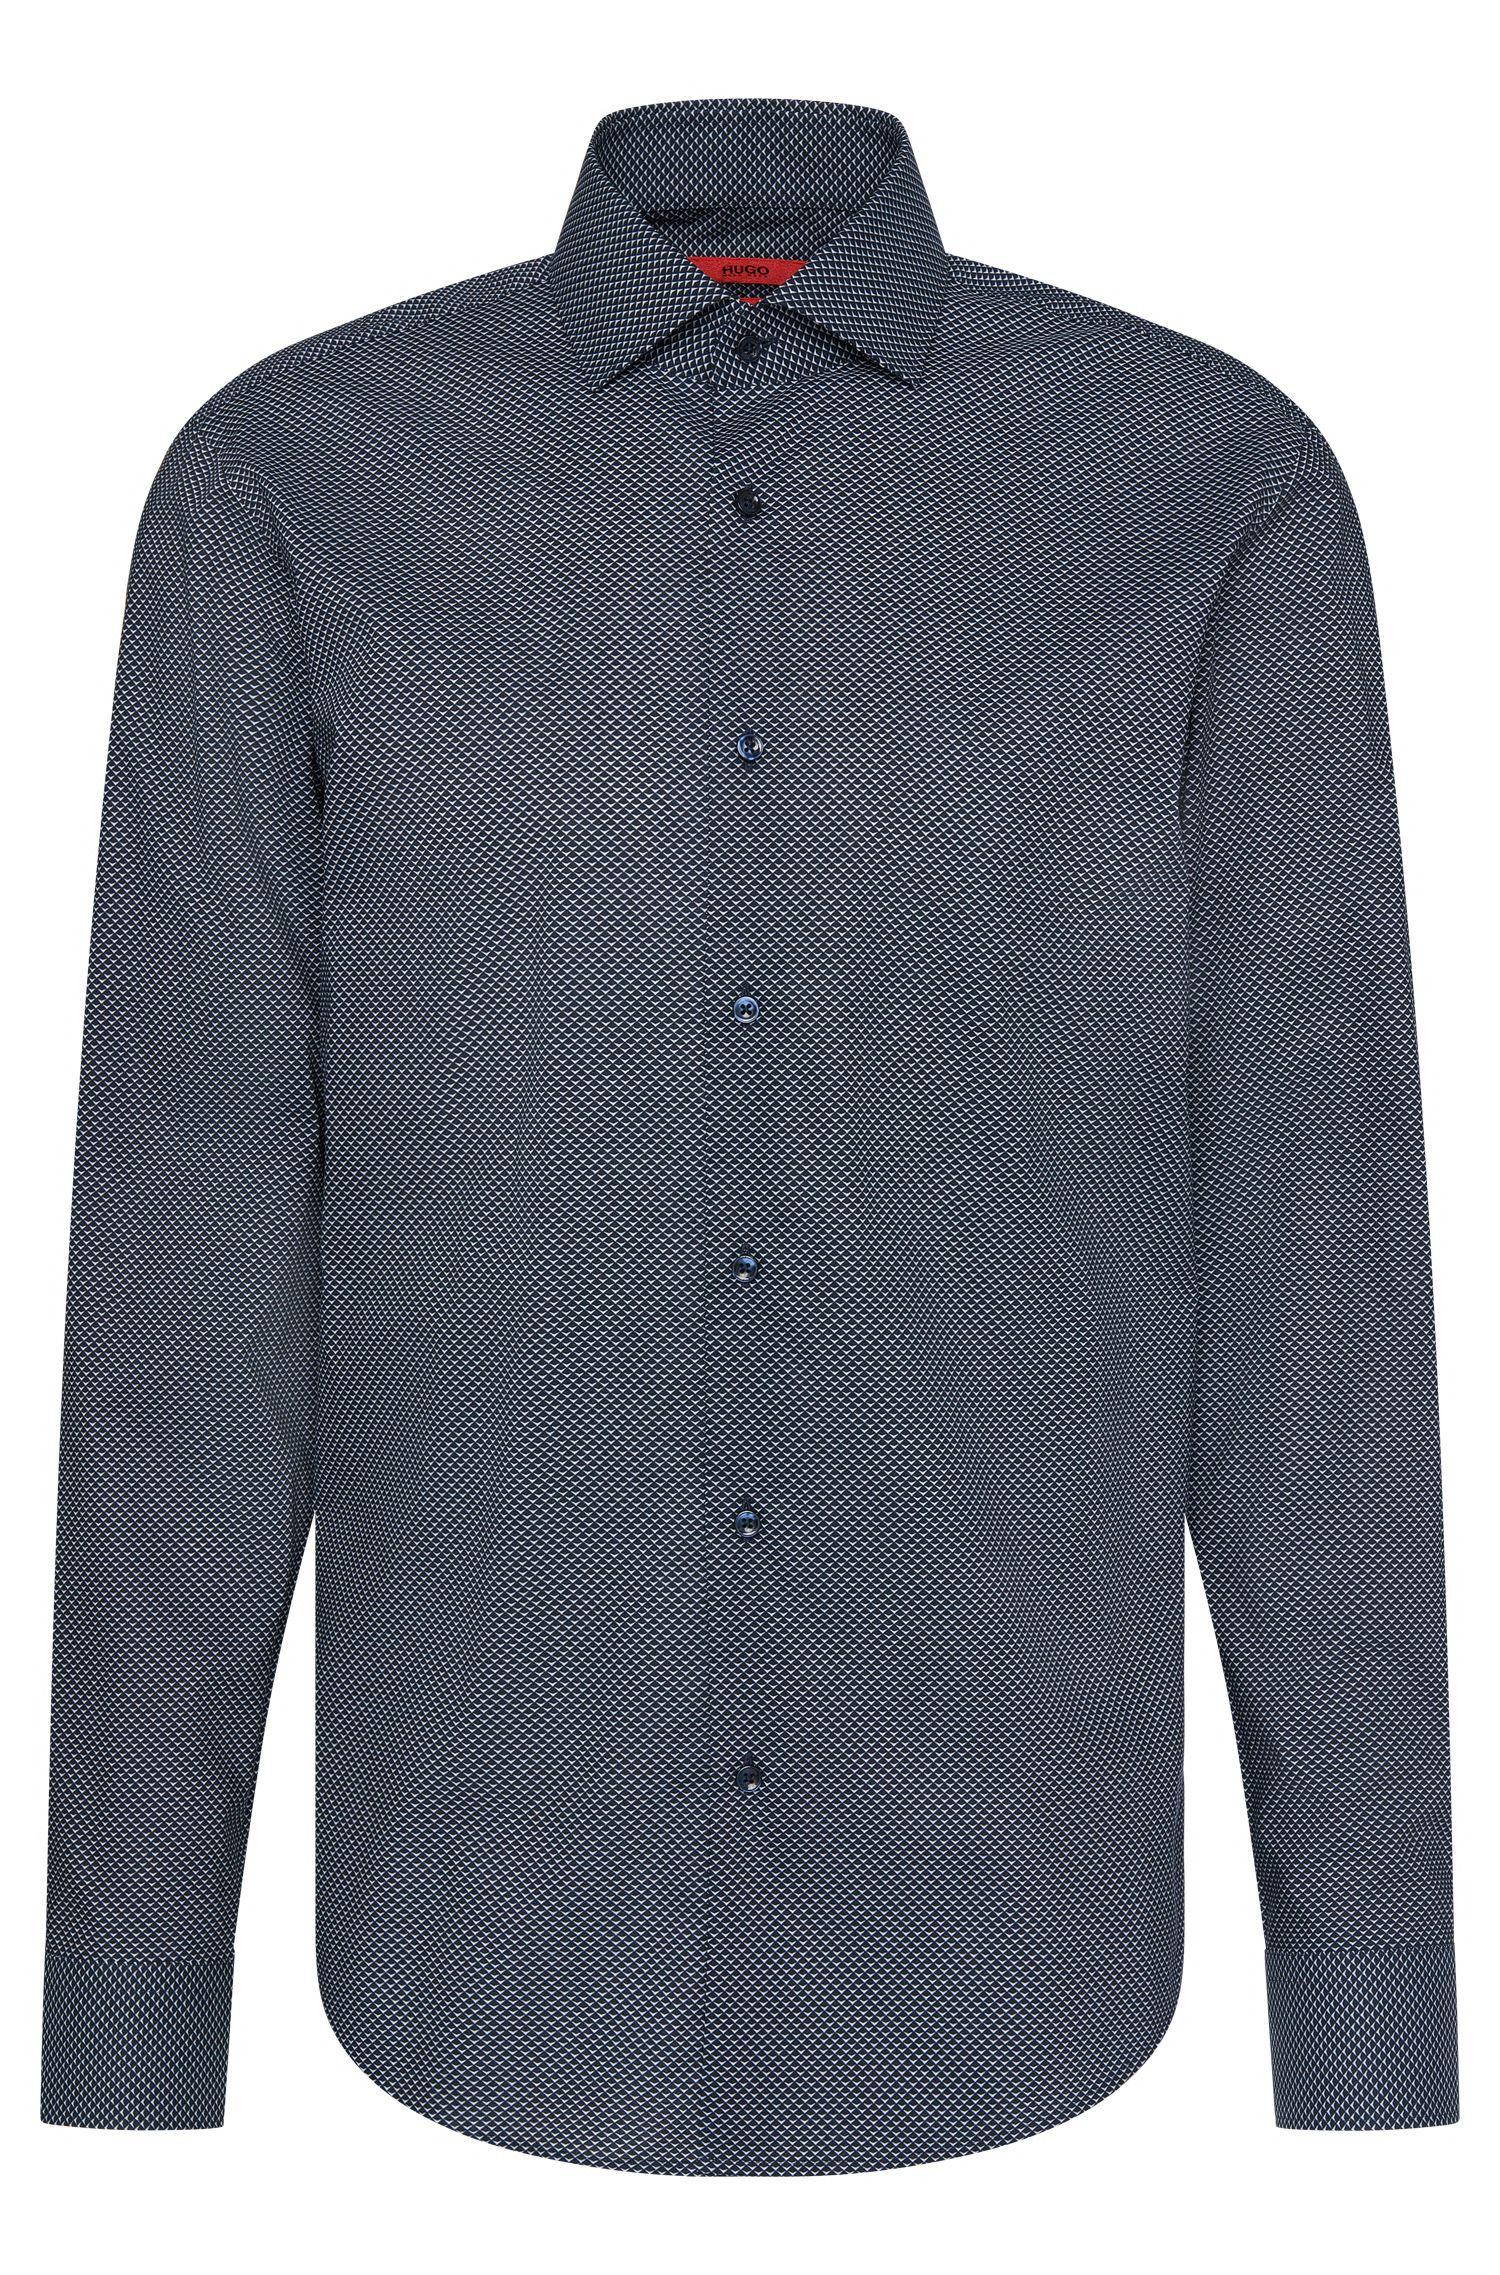 Patterned regular-fit shirt in cotton: 'C-Gordon'